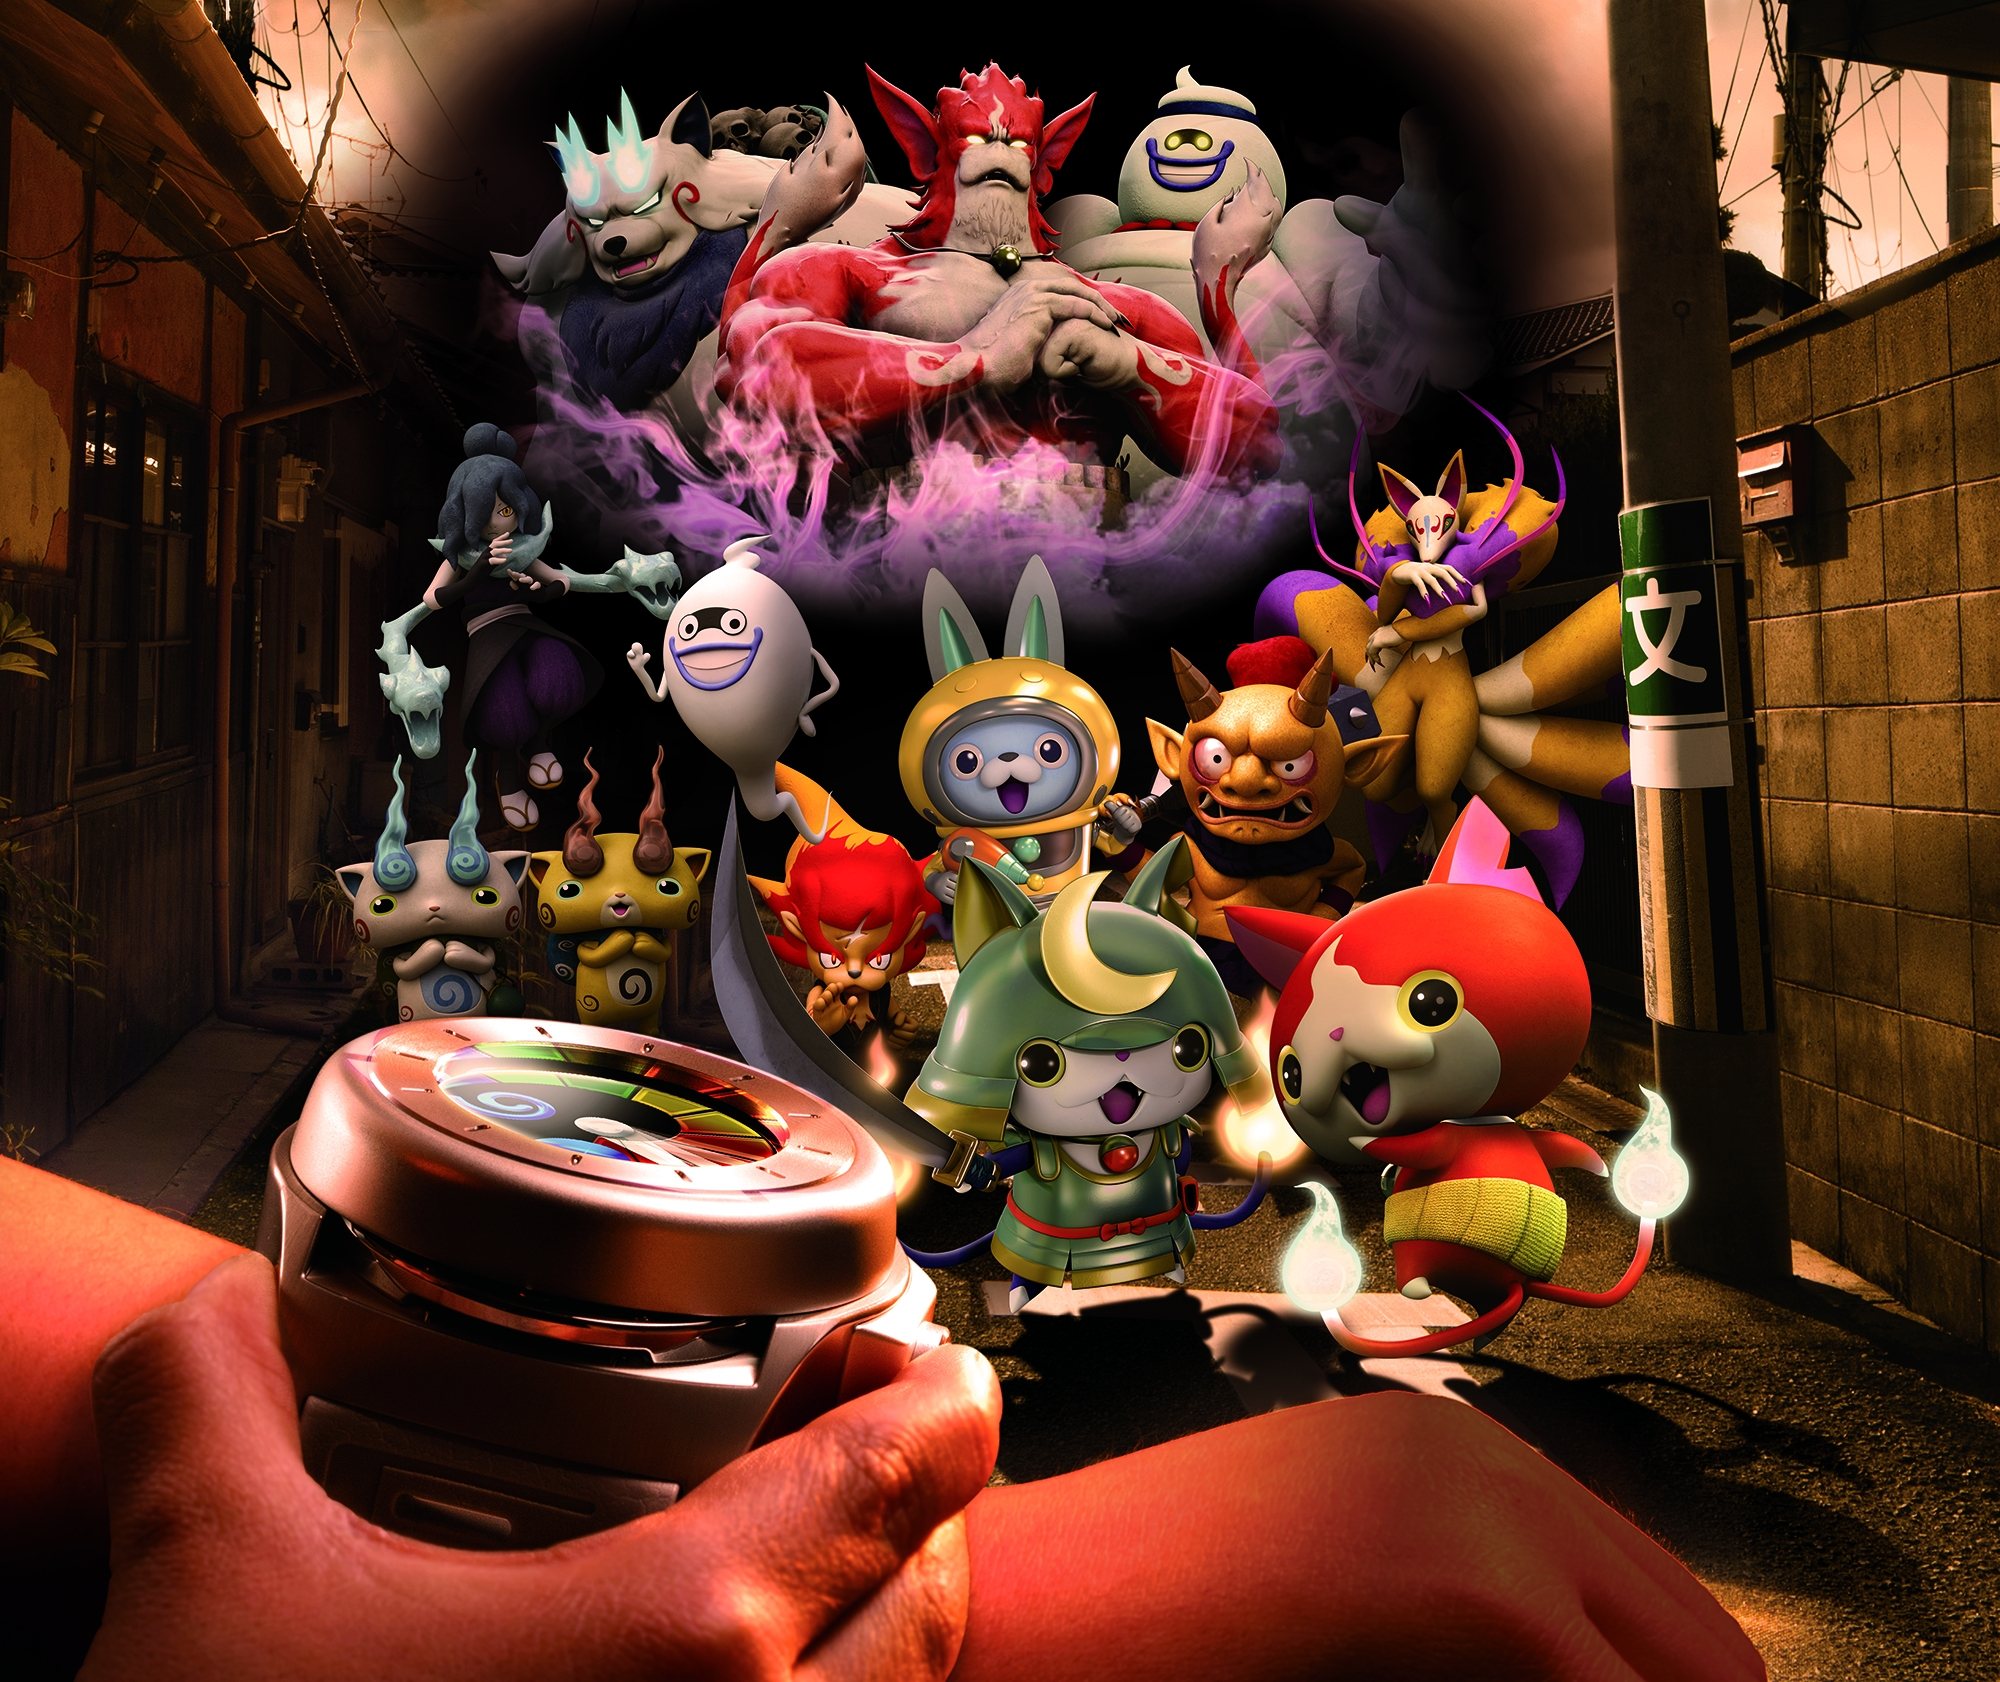 Usjでハロウィンイベント新アトラクション妖怪ウォッチザリアル2